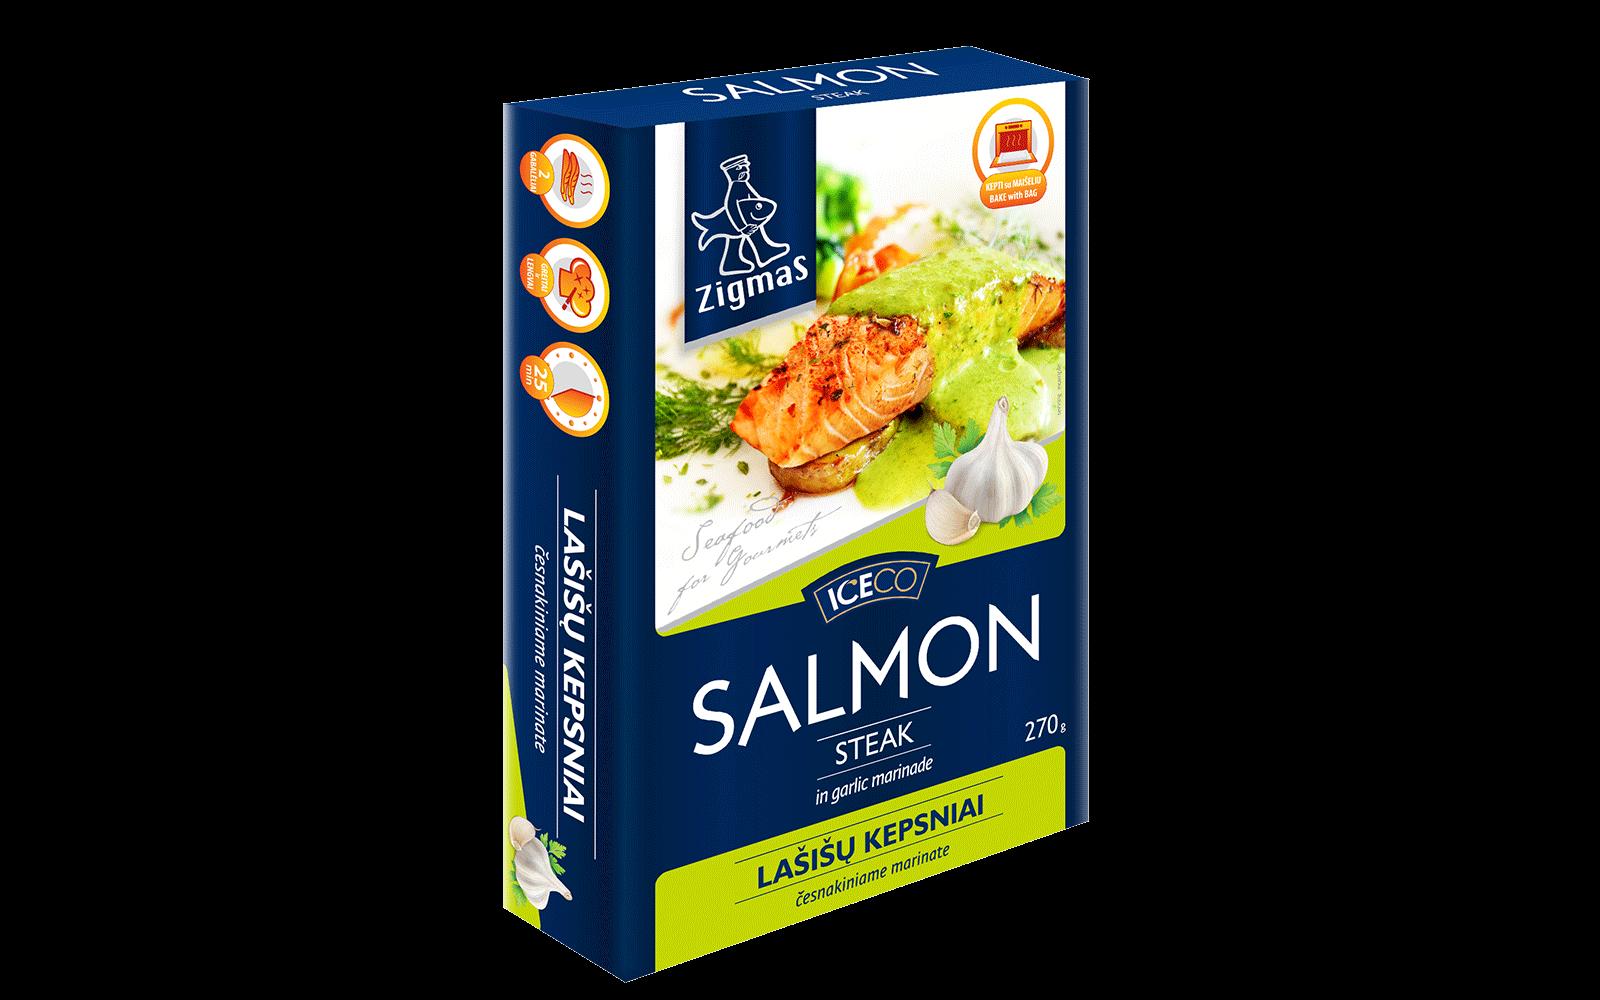 http://www.icecofish.com/wp-content/uploads/2016/06/zigmas-salmon-steak-in-garlic-marinade-1600x1000.png